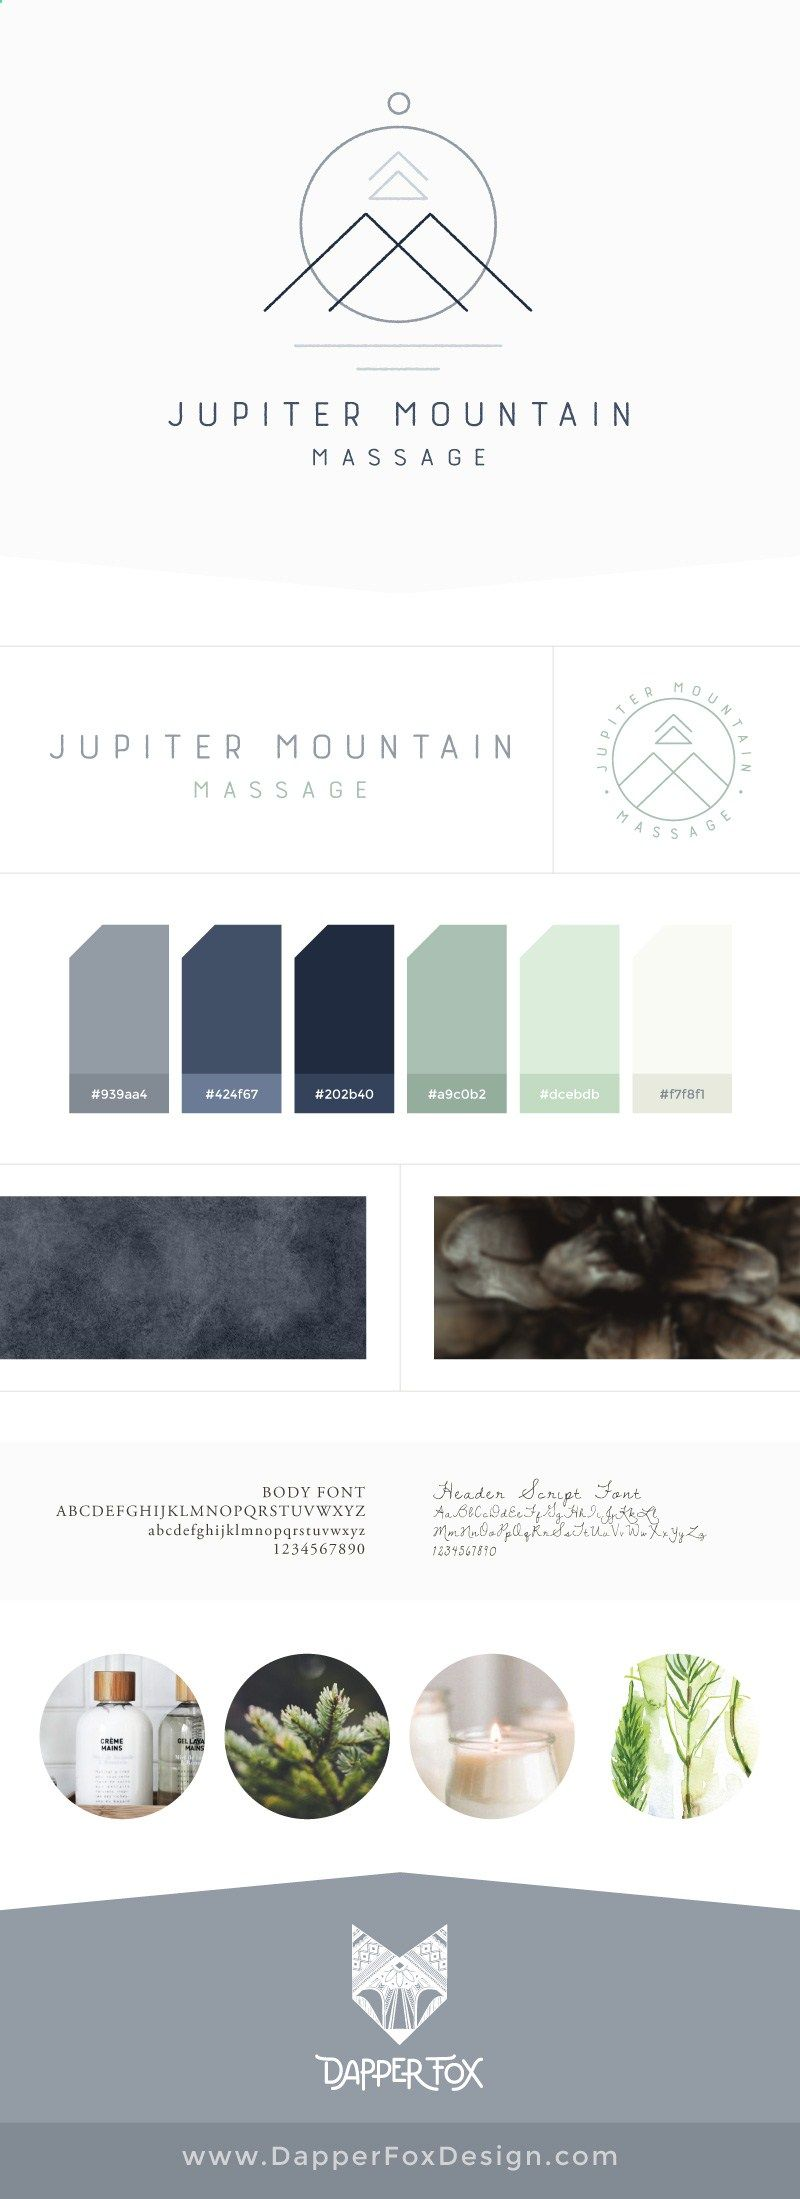 Modern Minimalistic Rustic Simple Logo Design | by Dapper Fox Design - Branding, Logos   Website Design